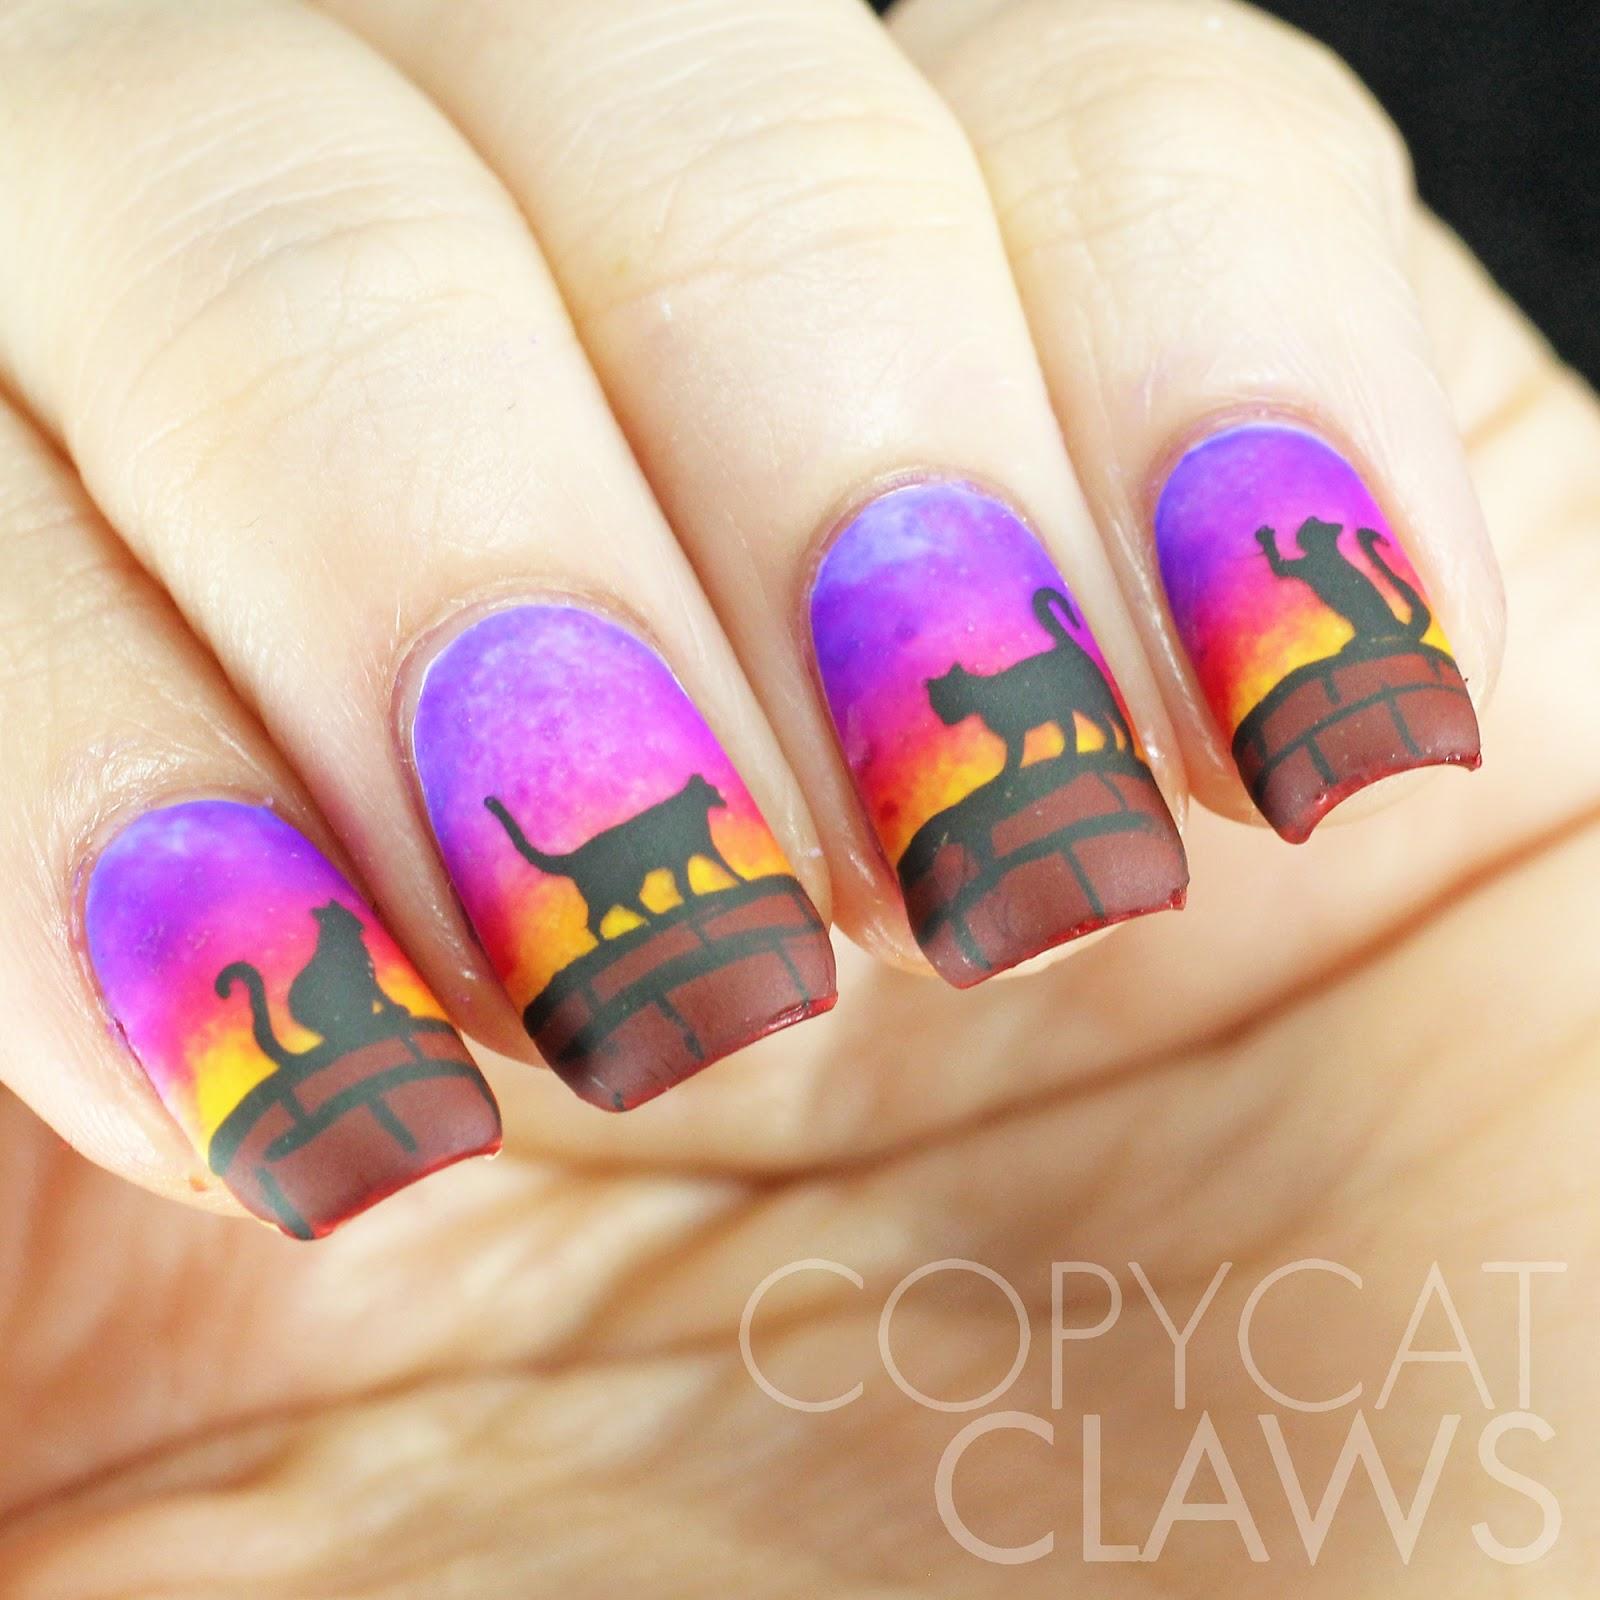 Copycat Claws: Cats At Sunset Nail Art